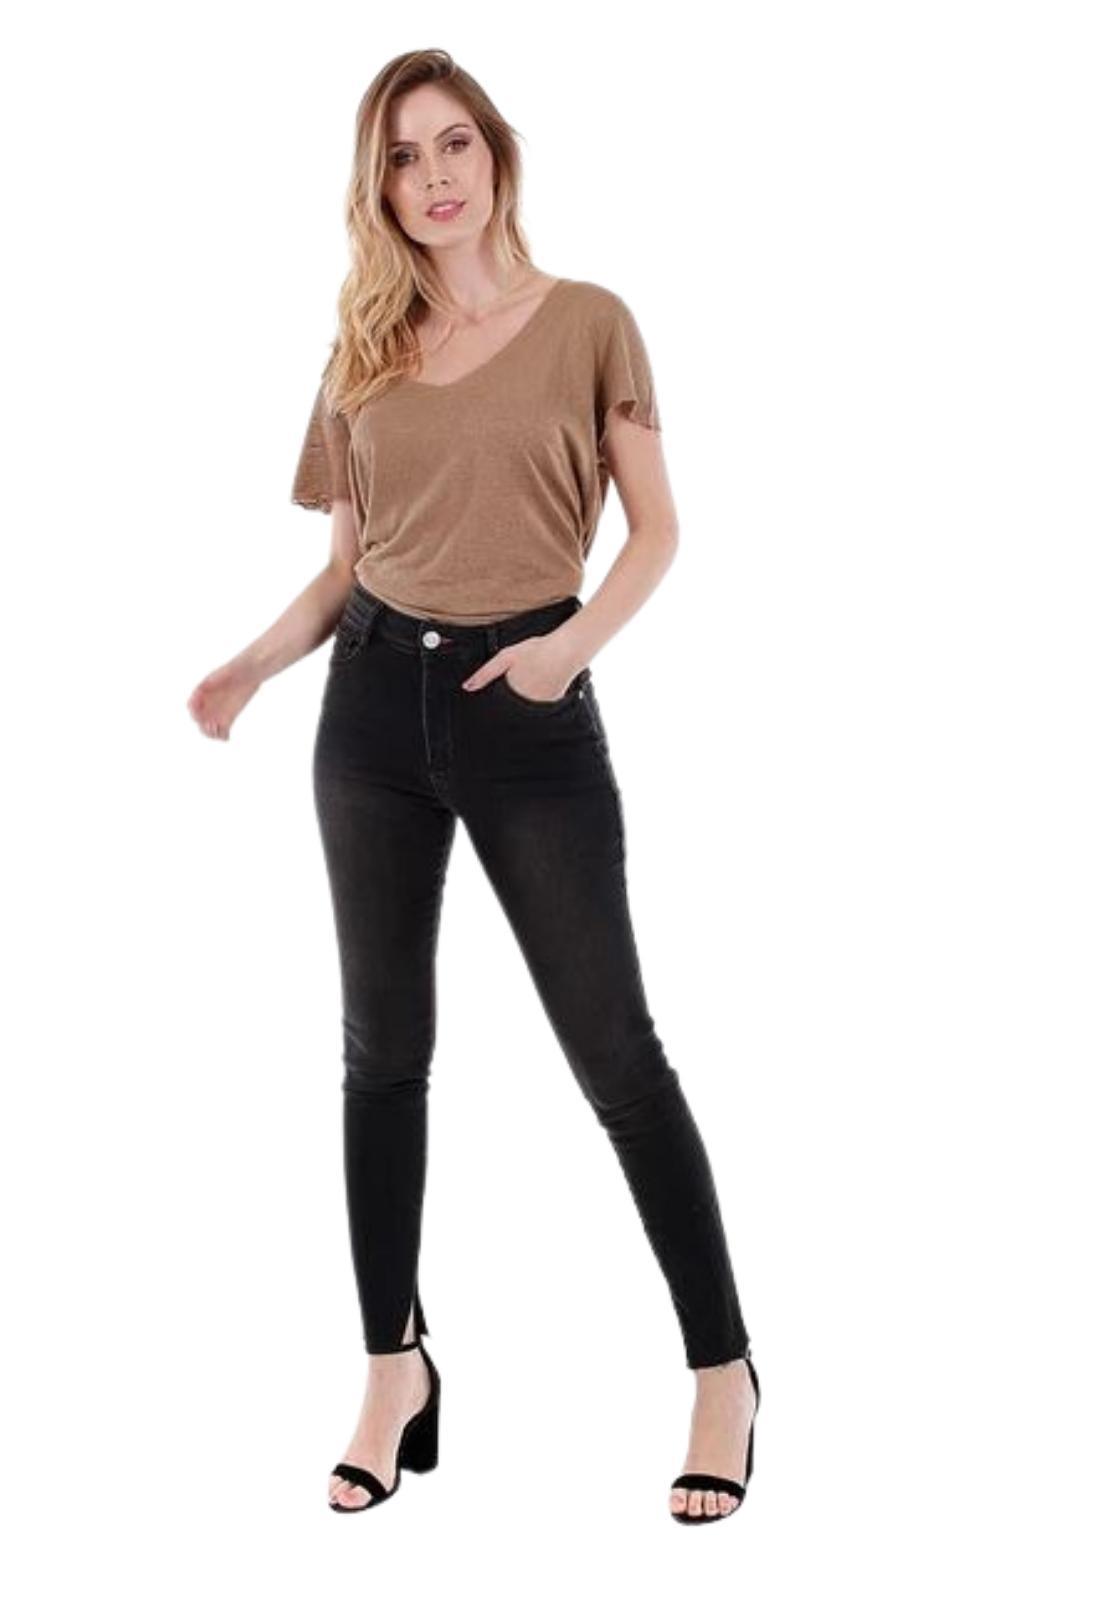 Calça Feminina Jeans Black Skinny Com Abertura Lateral